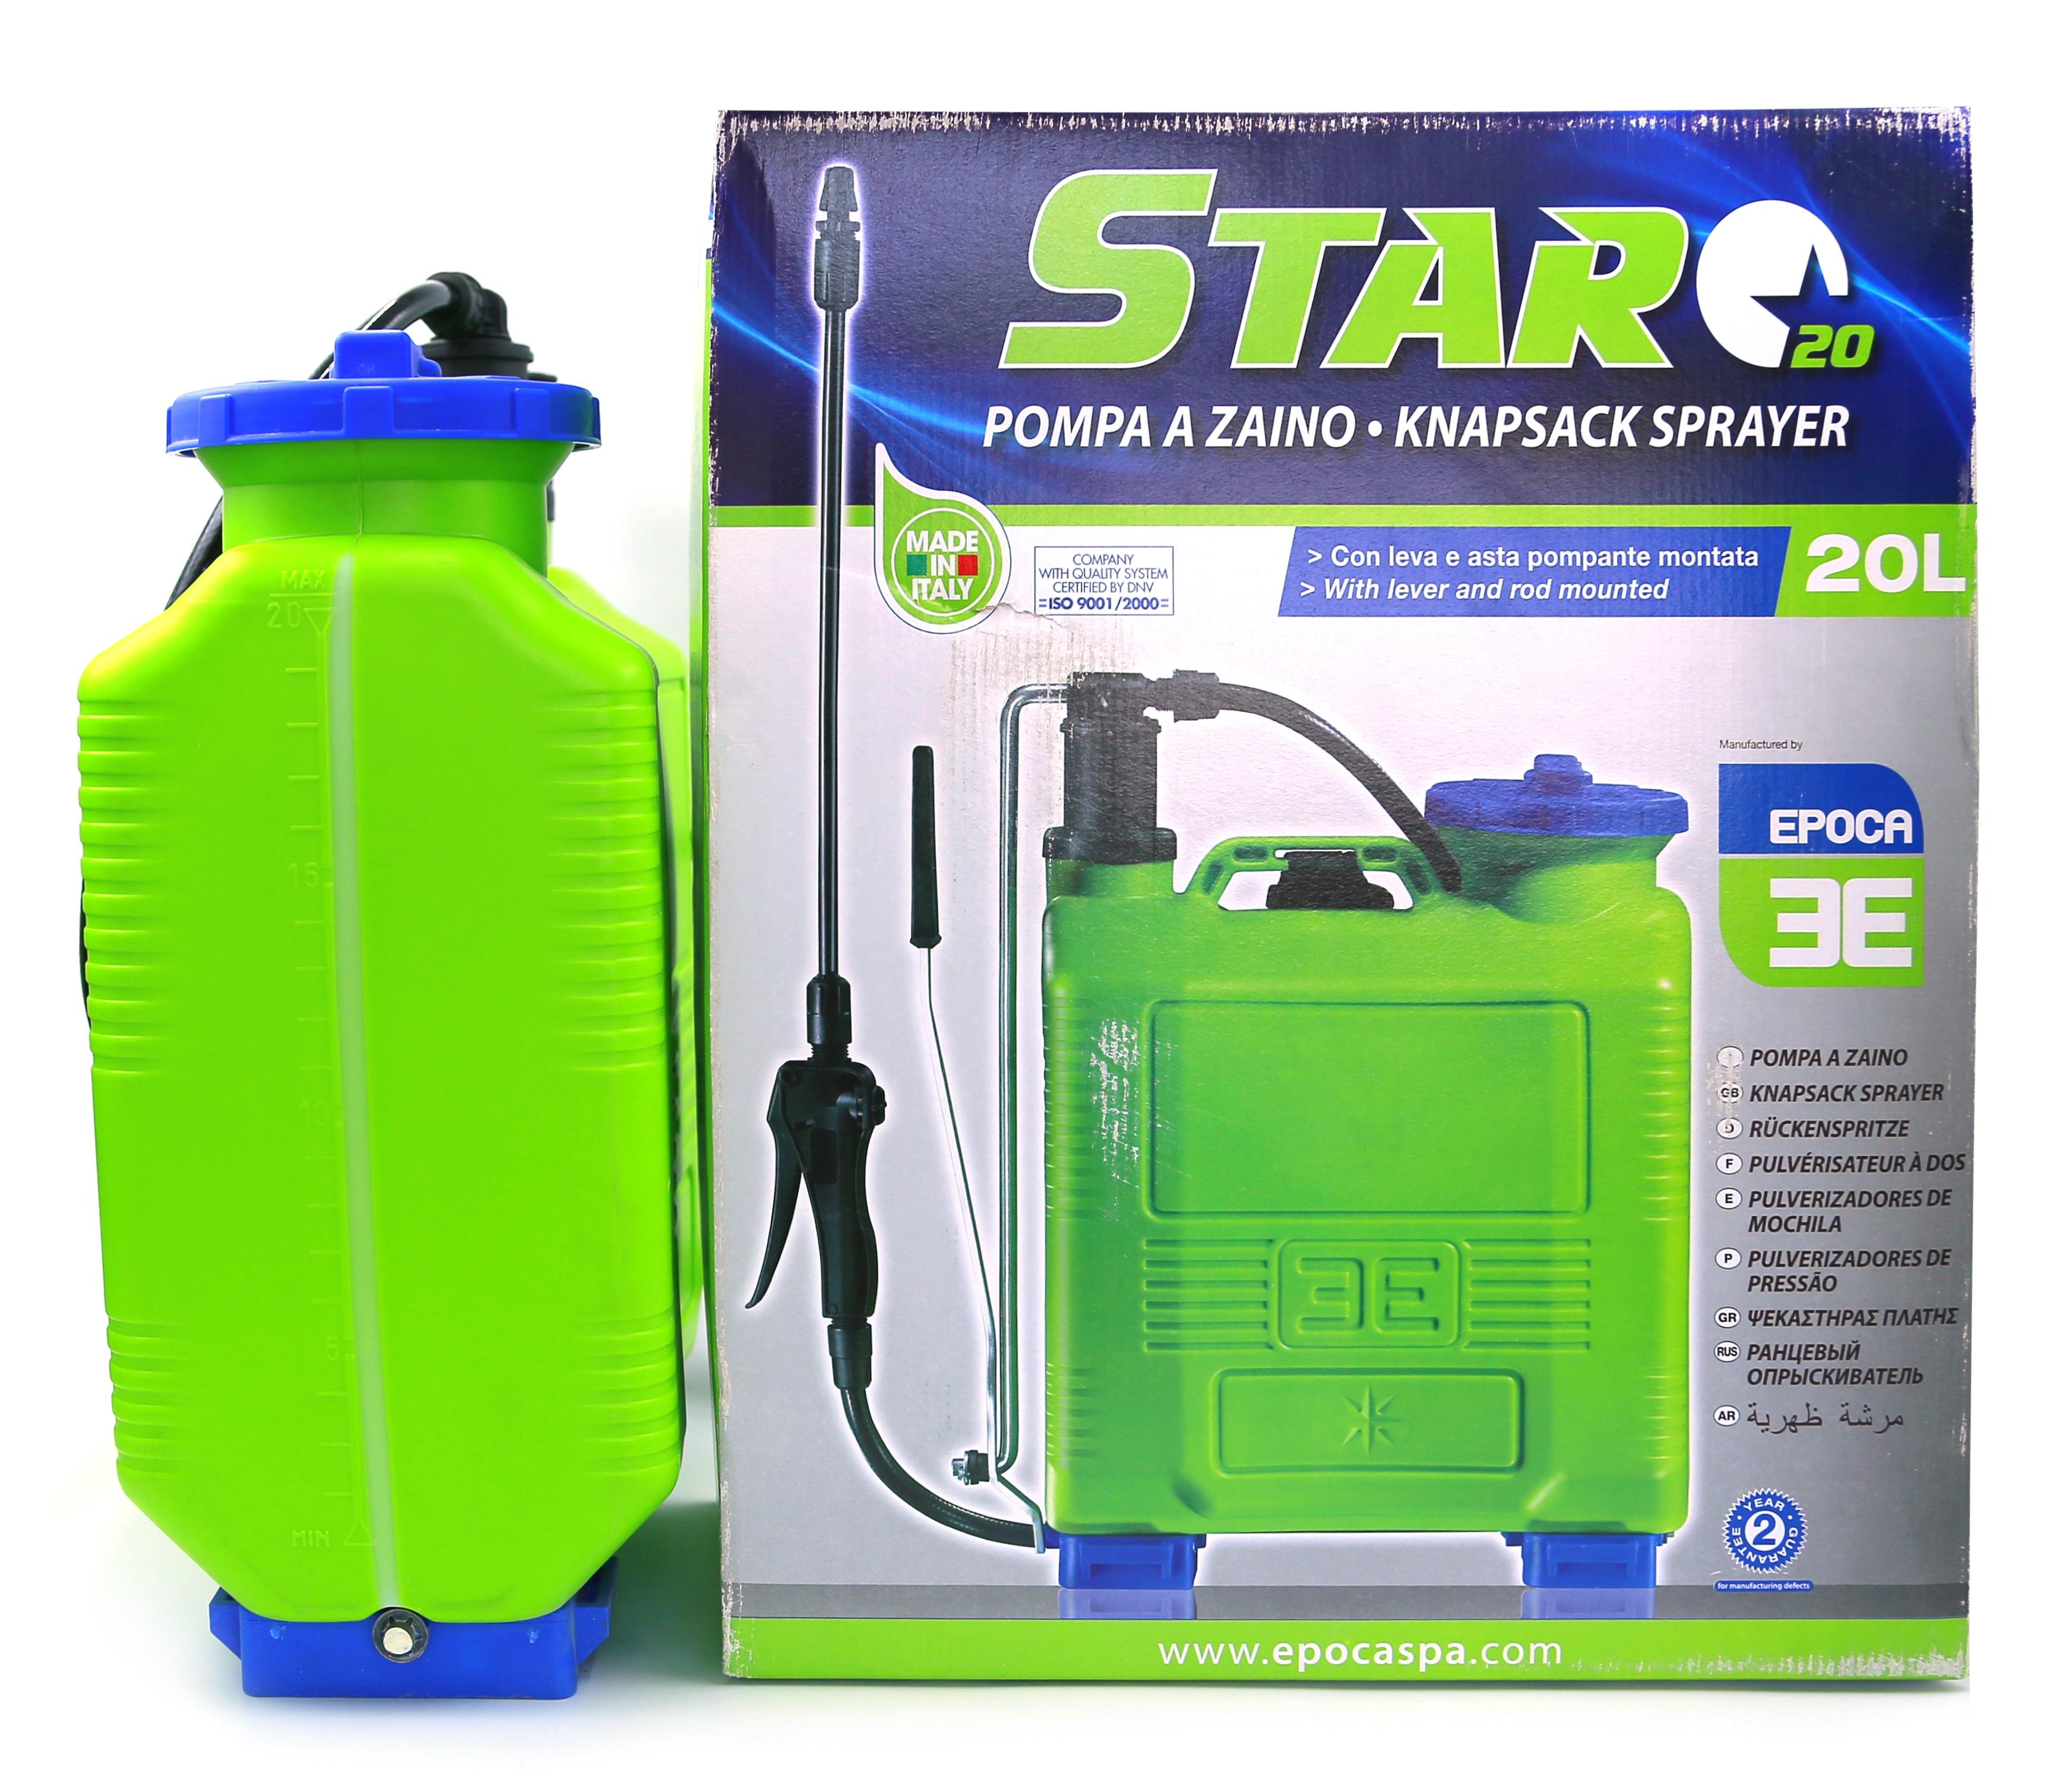 Italy Knapsack sprayers Star 20 Ltr (Epoca)